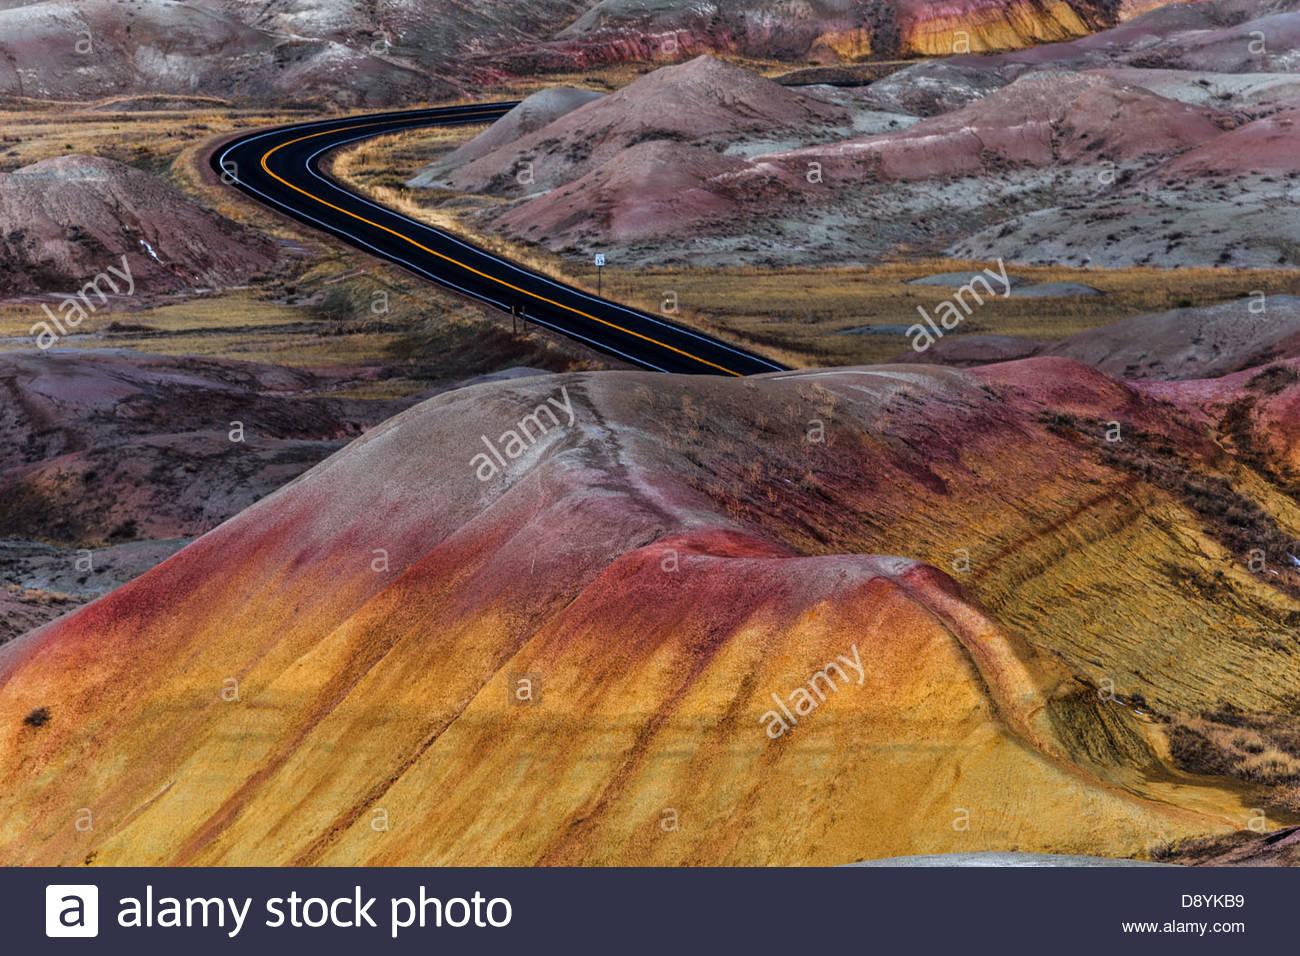 Badlands National Park, South Dakota, USA - Stock Image